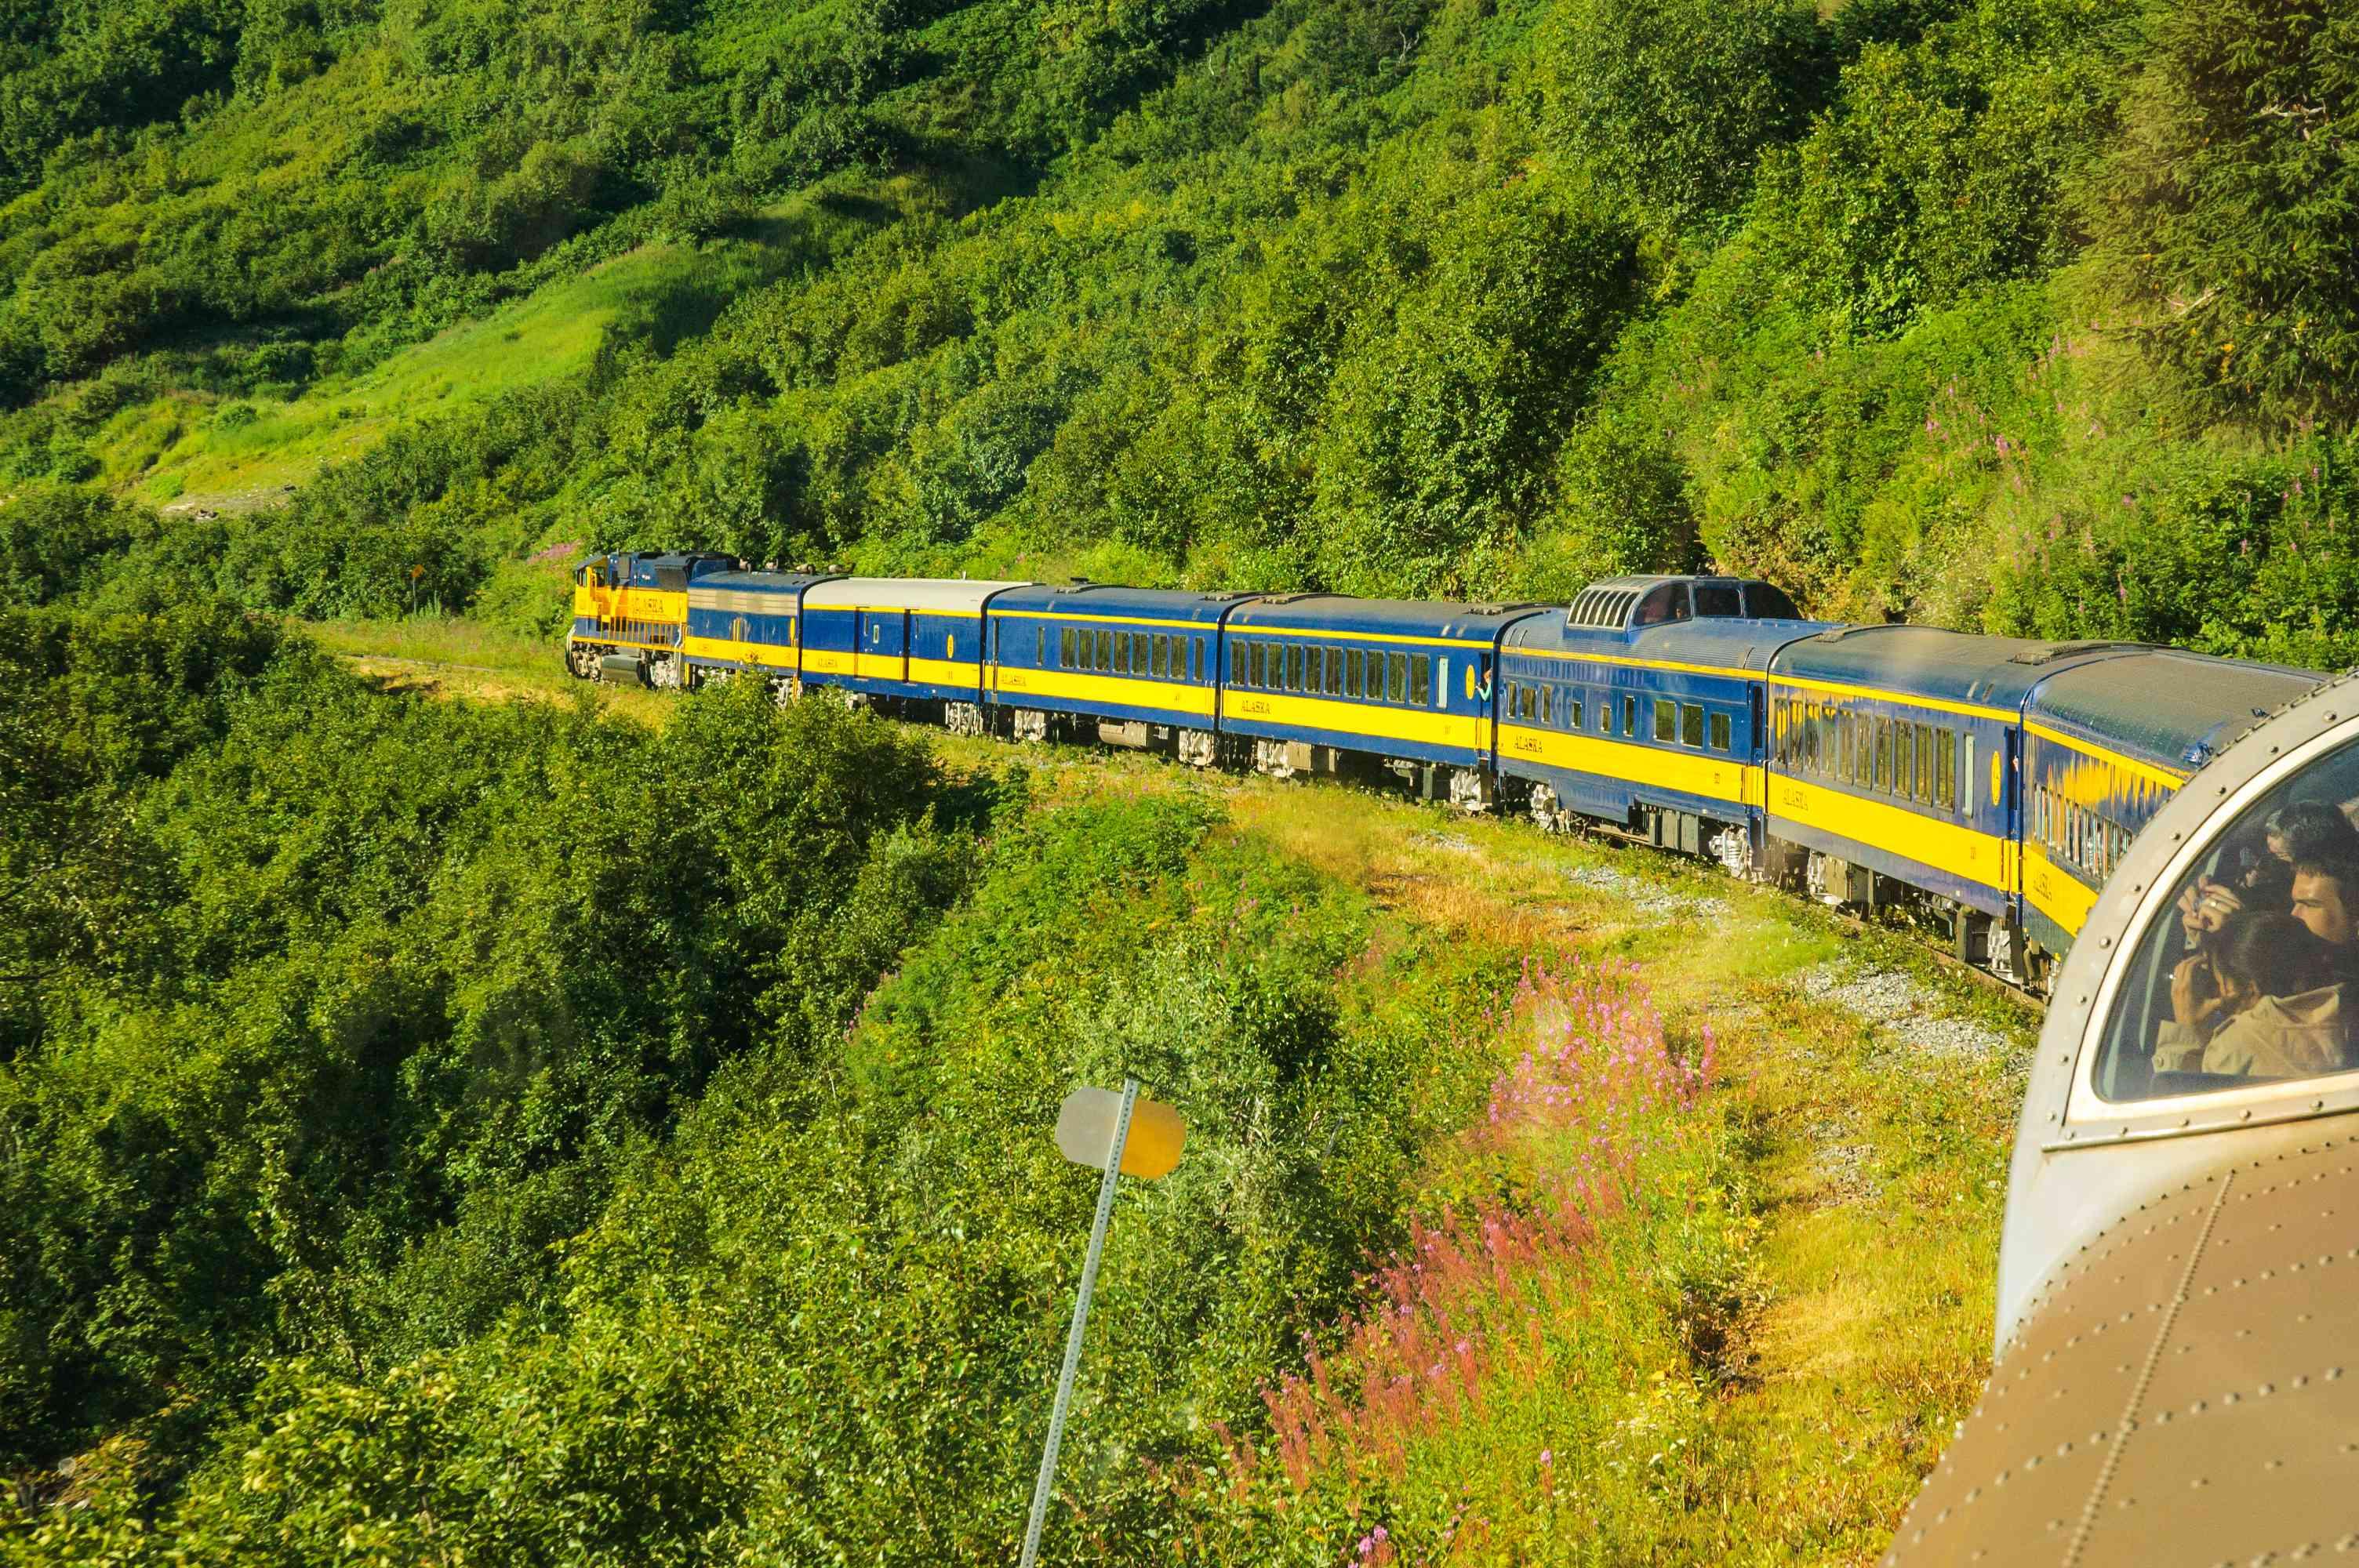 Alaska Coastal Classic train with green foliage all around